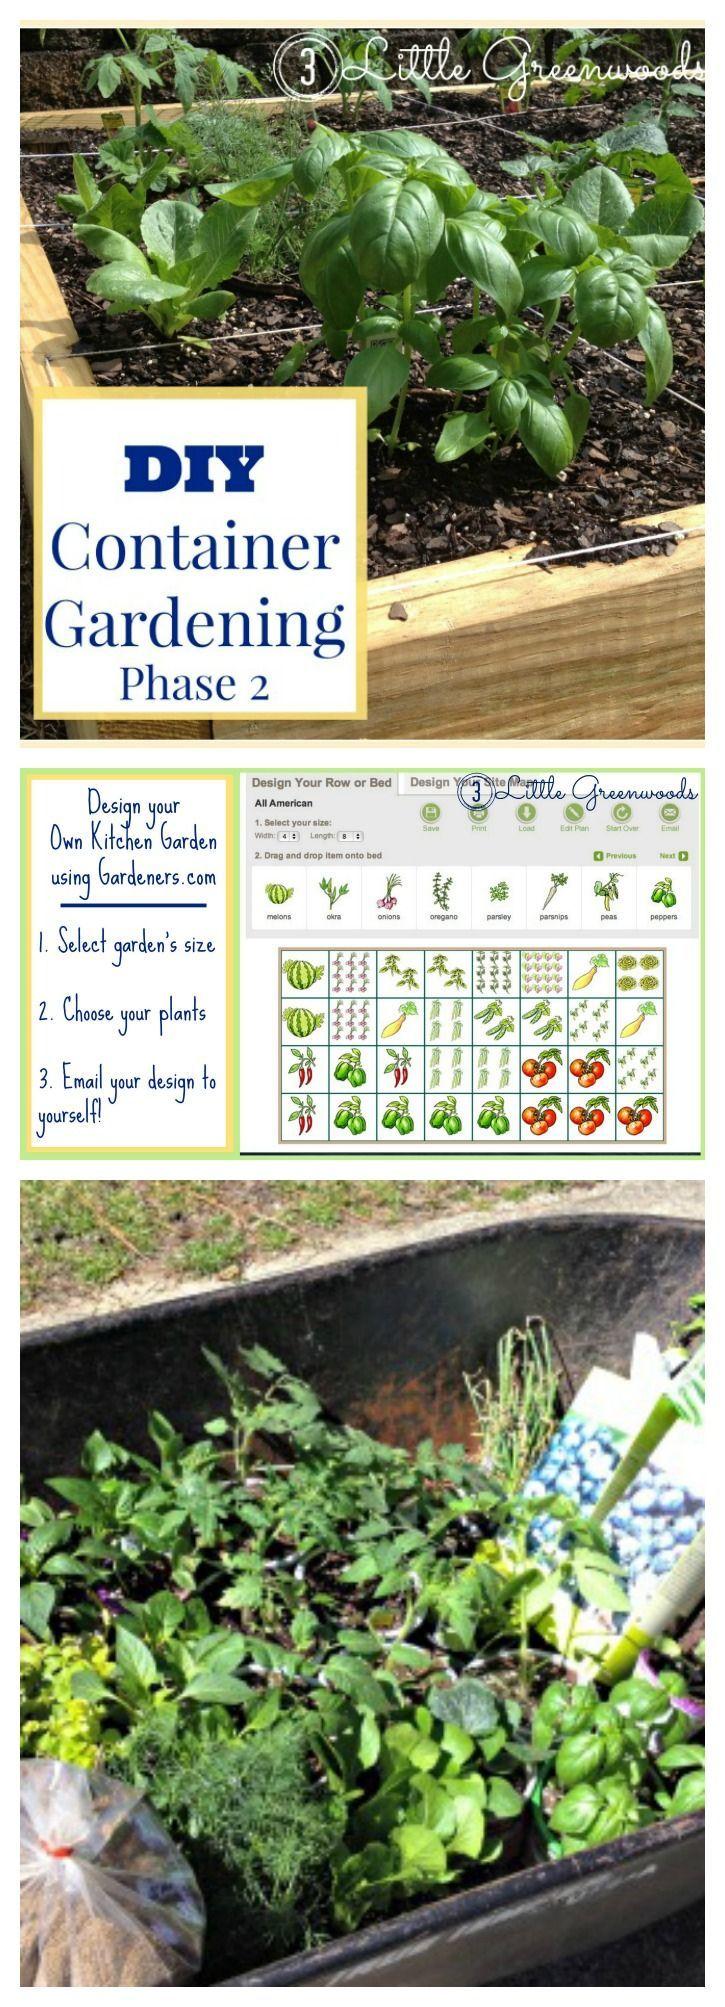 Diy Container Garden Planning And Planting Diy Container Gardening Container Gardening Backyard Vegetable Gardens Backyard garden grow your own